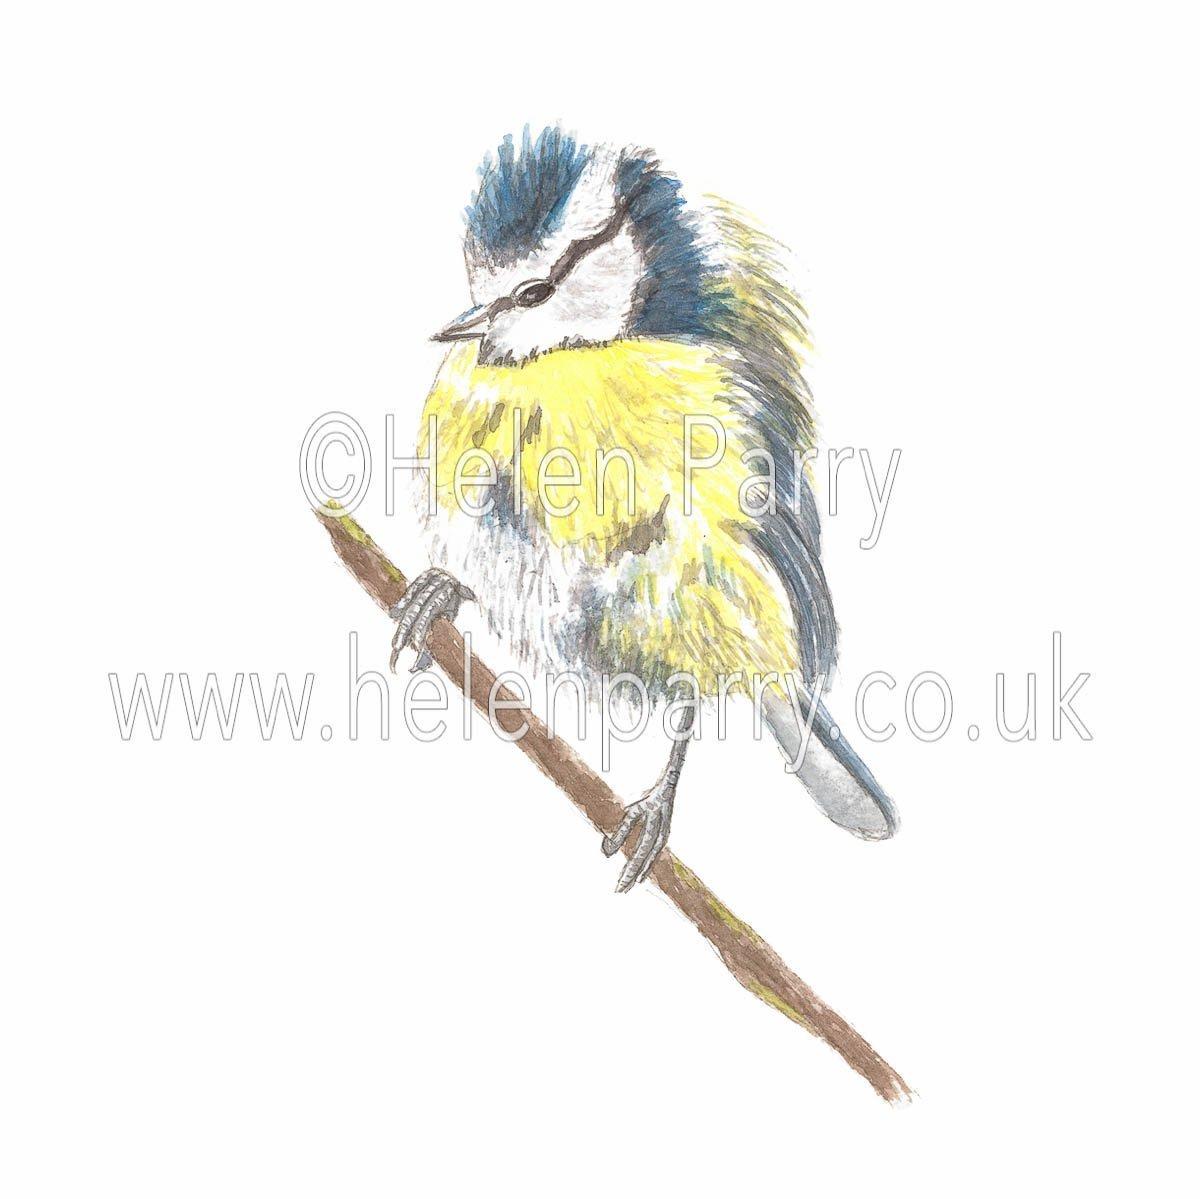 watercolour painting of Blue Tit bird